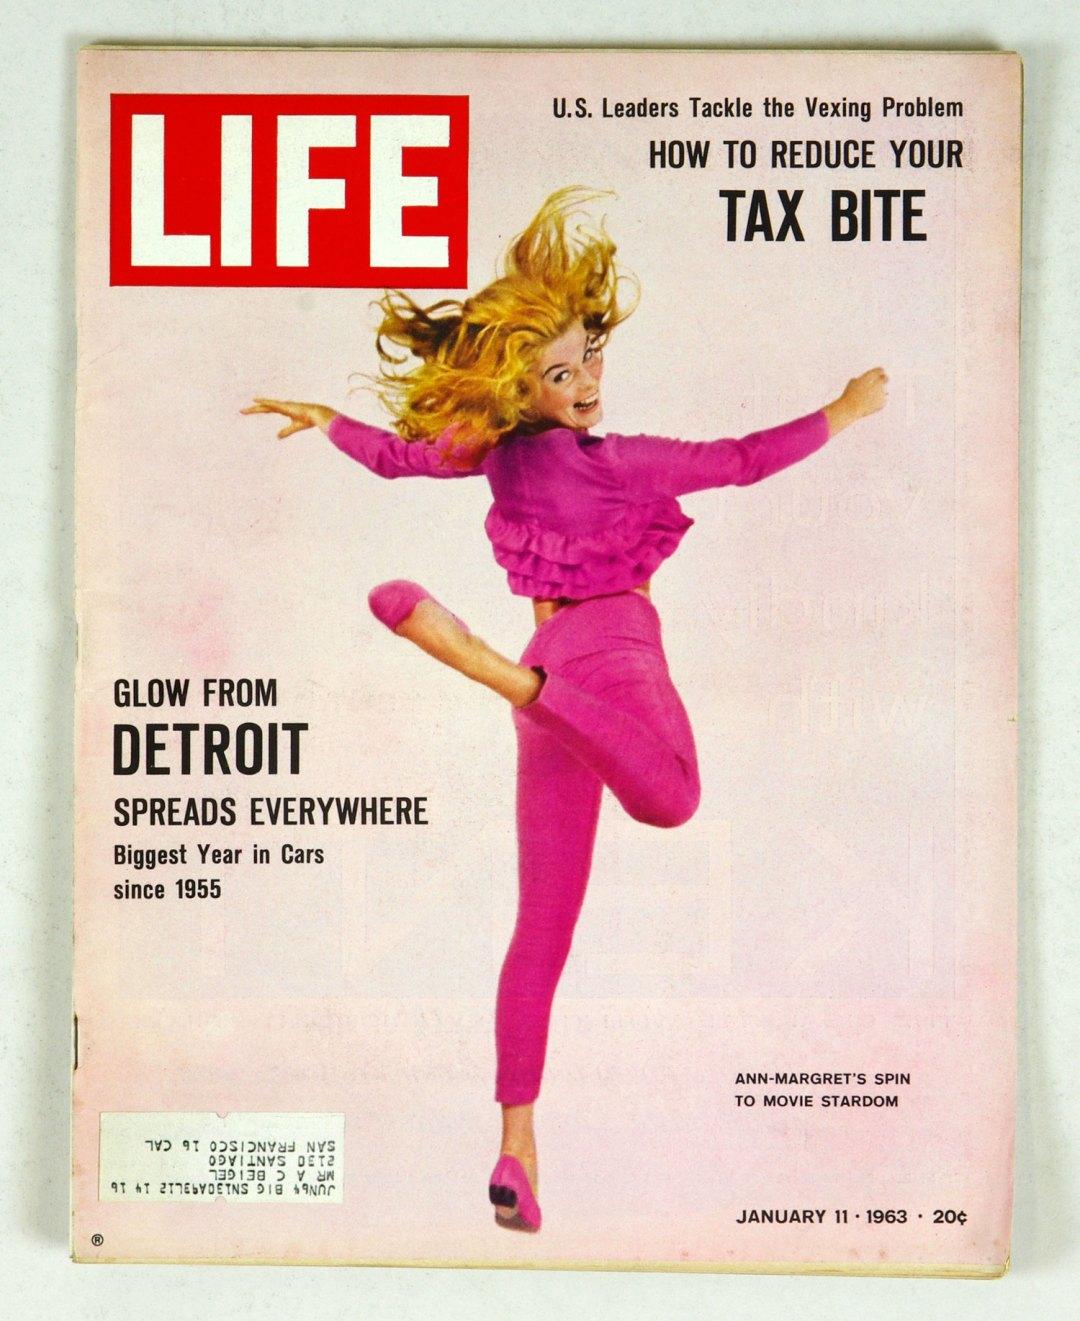 LIFE Magazine 1963 January 11 Ann Margret's Spin to Movie Stardom